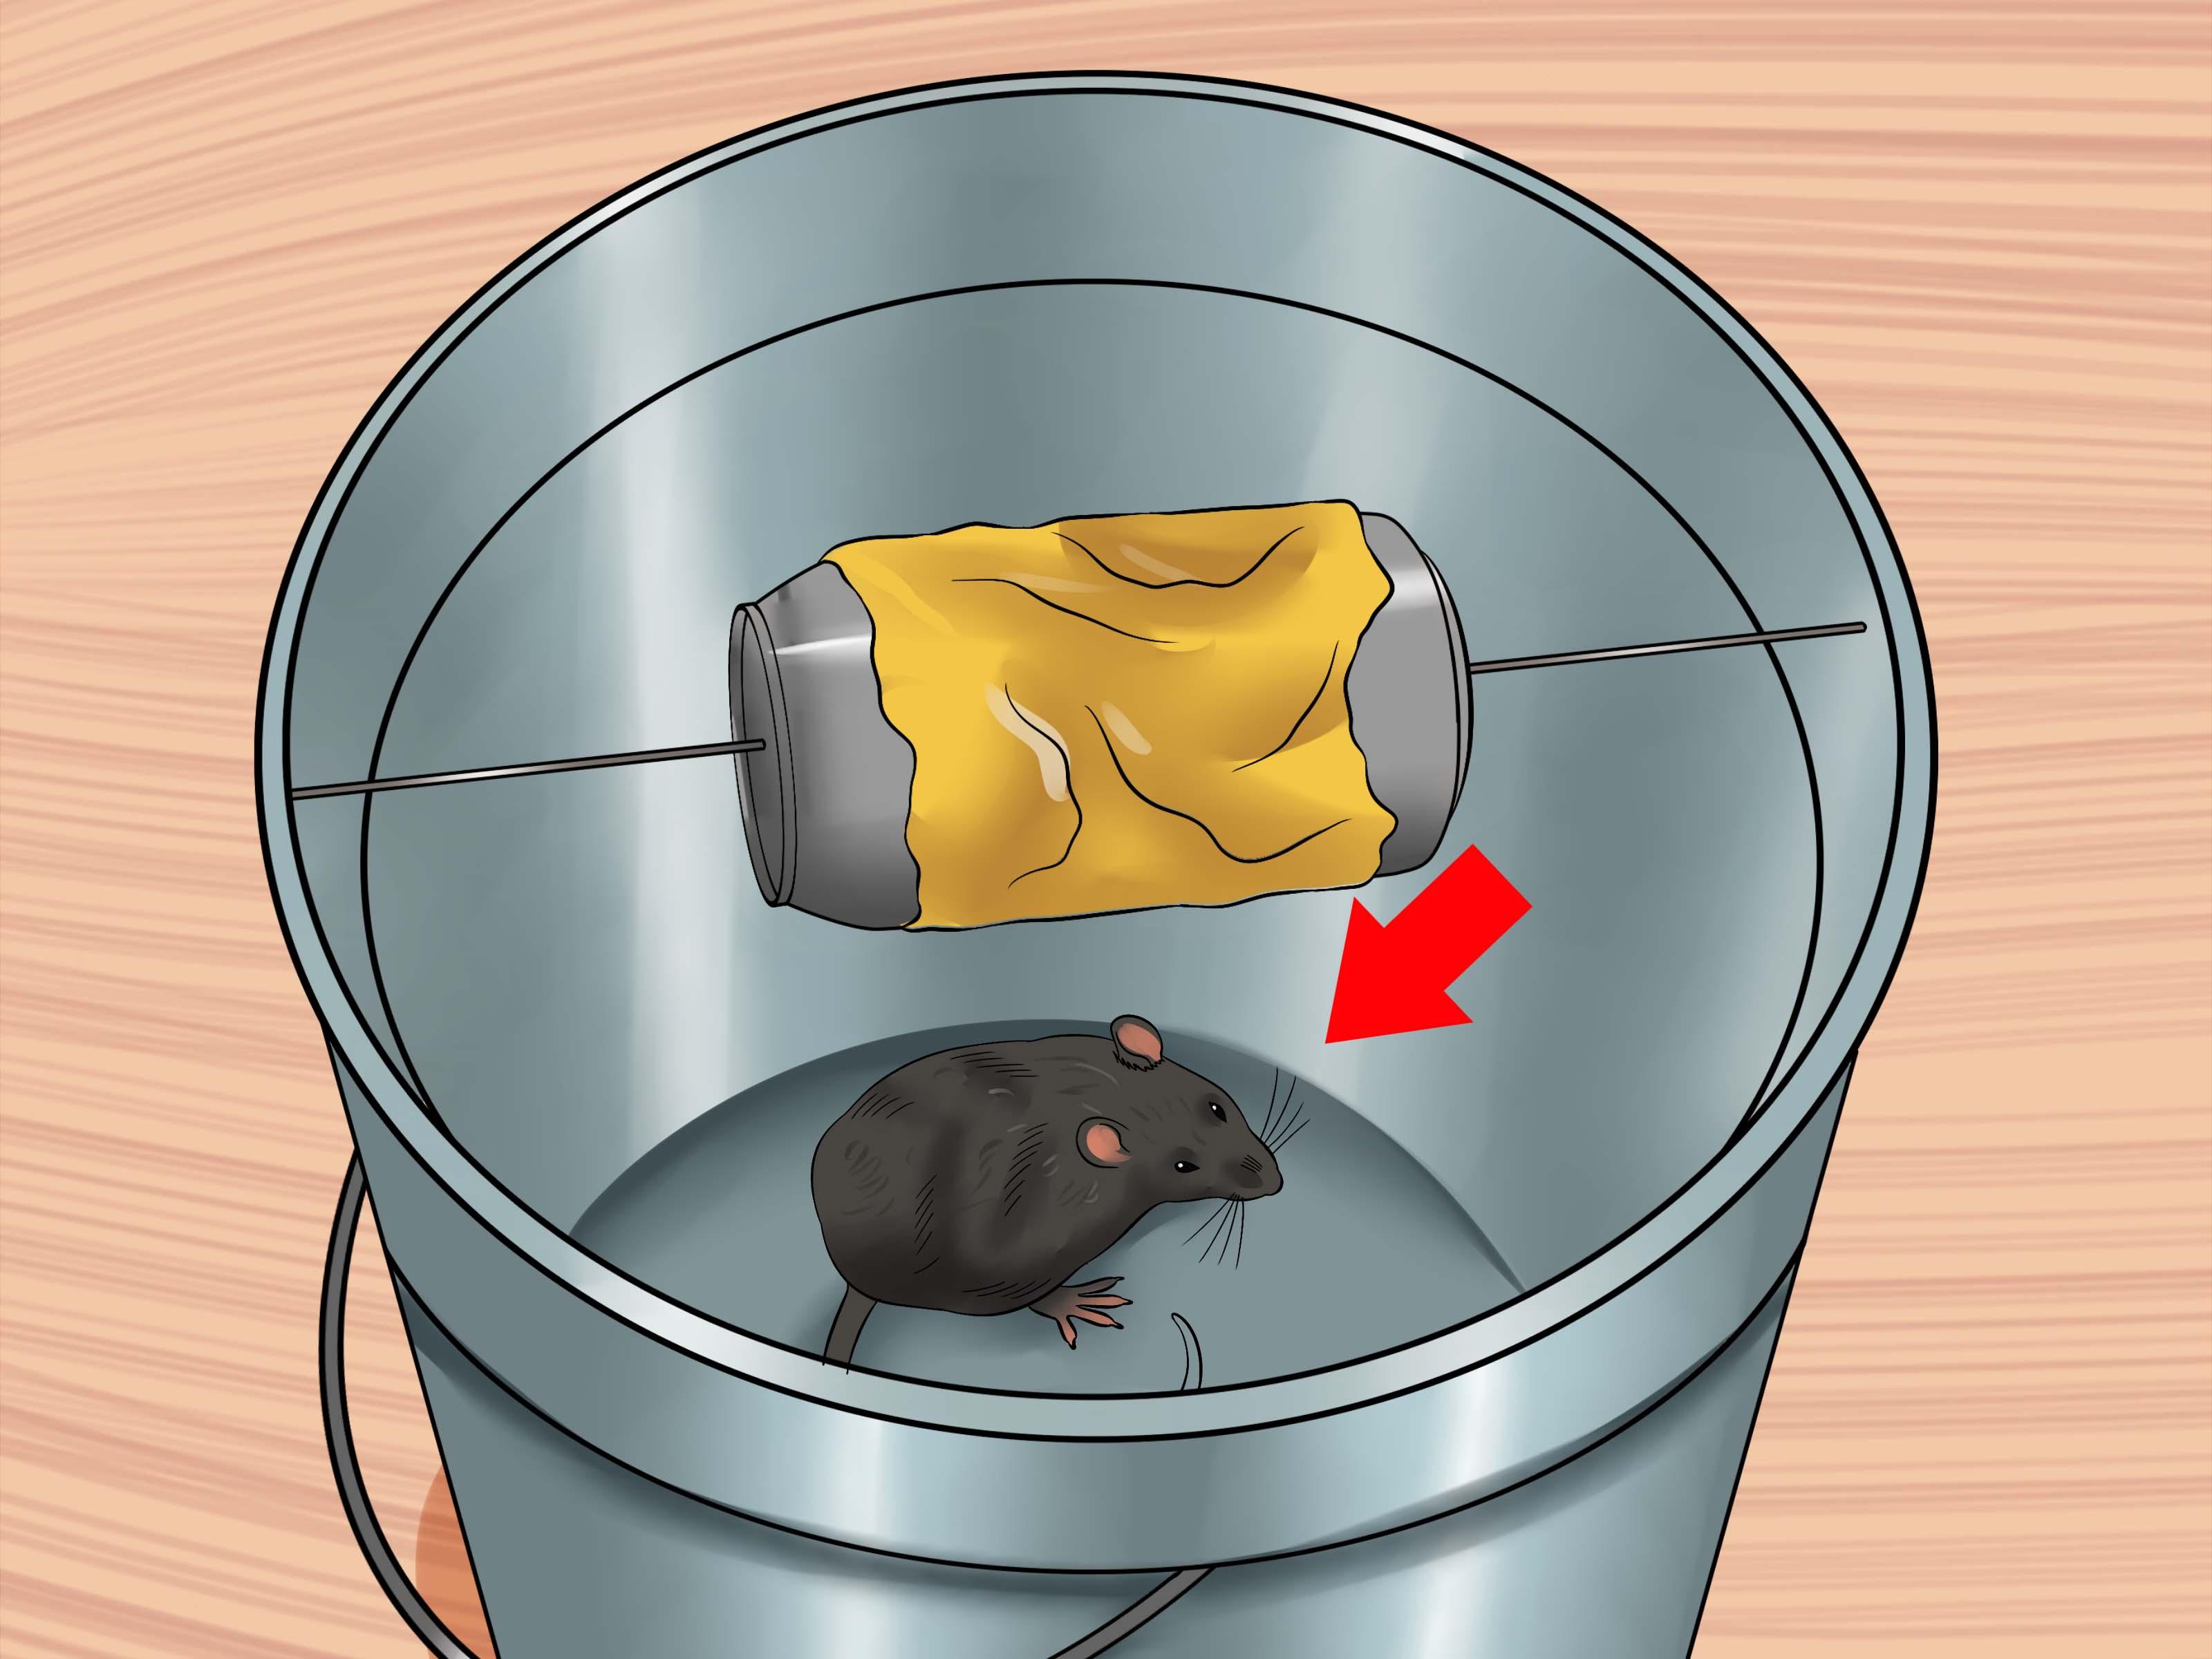 3 Manieres De Attraper Un Rat Domestique Qui S Est Echappe